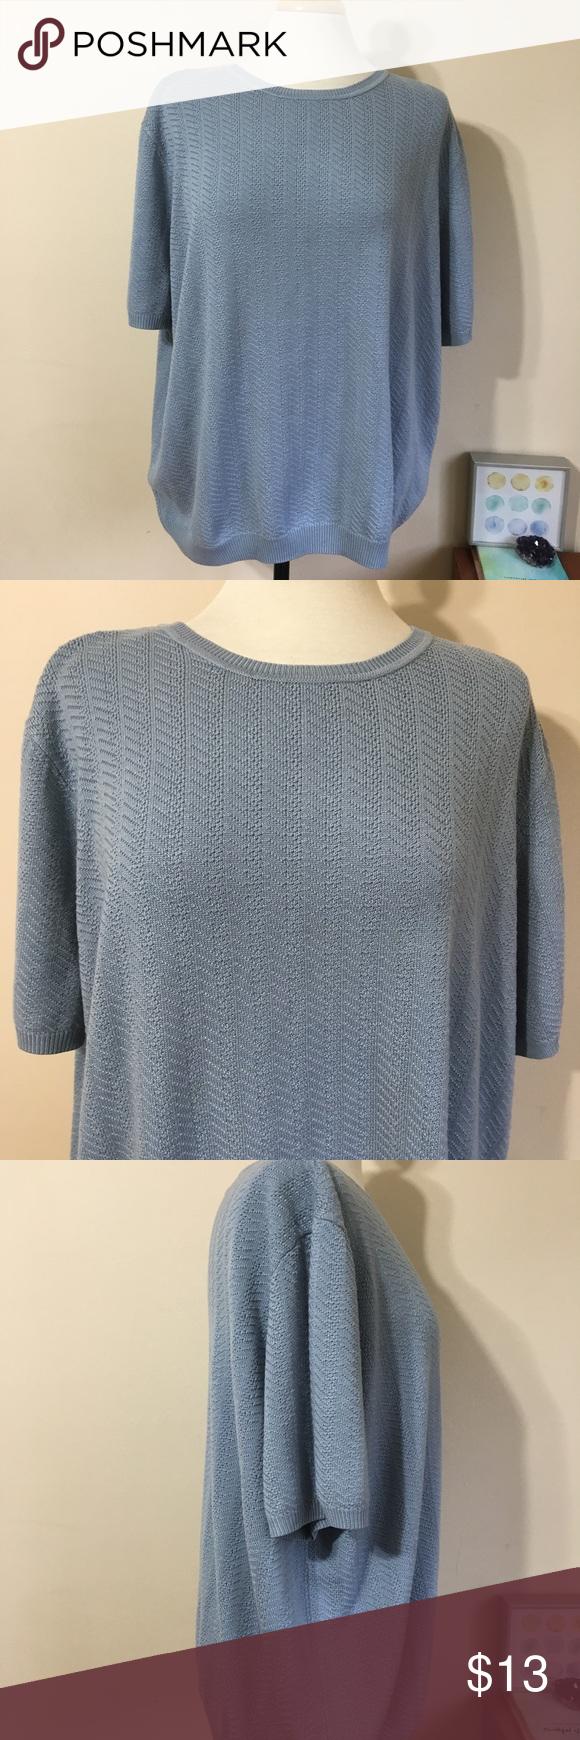 Alfred Dunner Light Blue Short Sleeve Knit Sweater | Acrylic ...